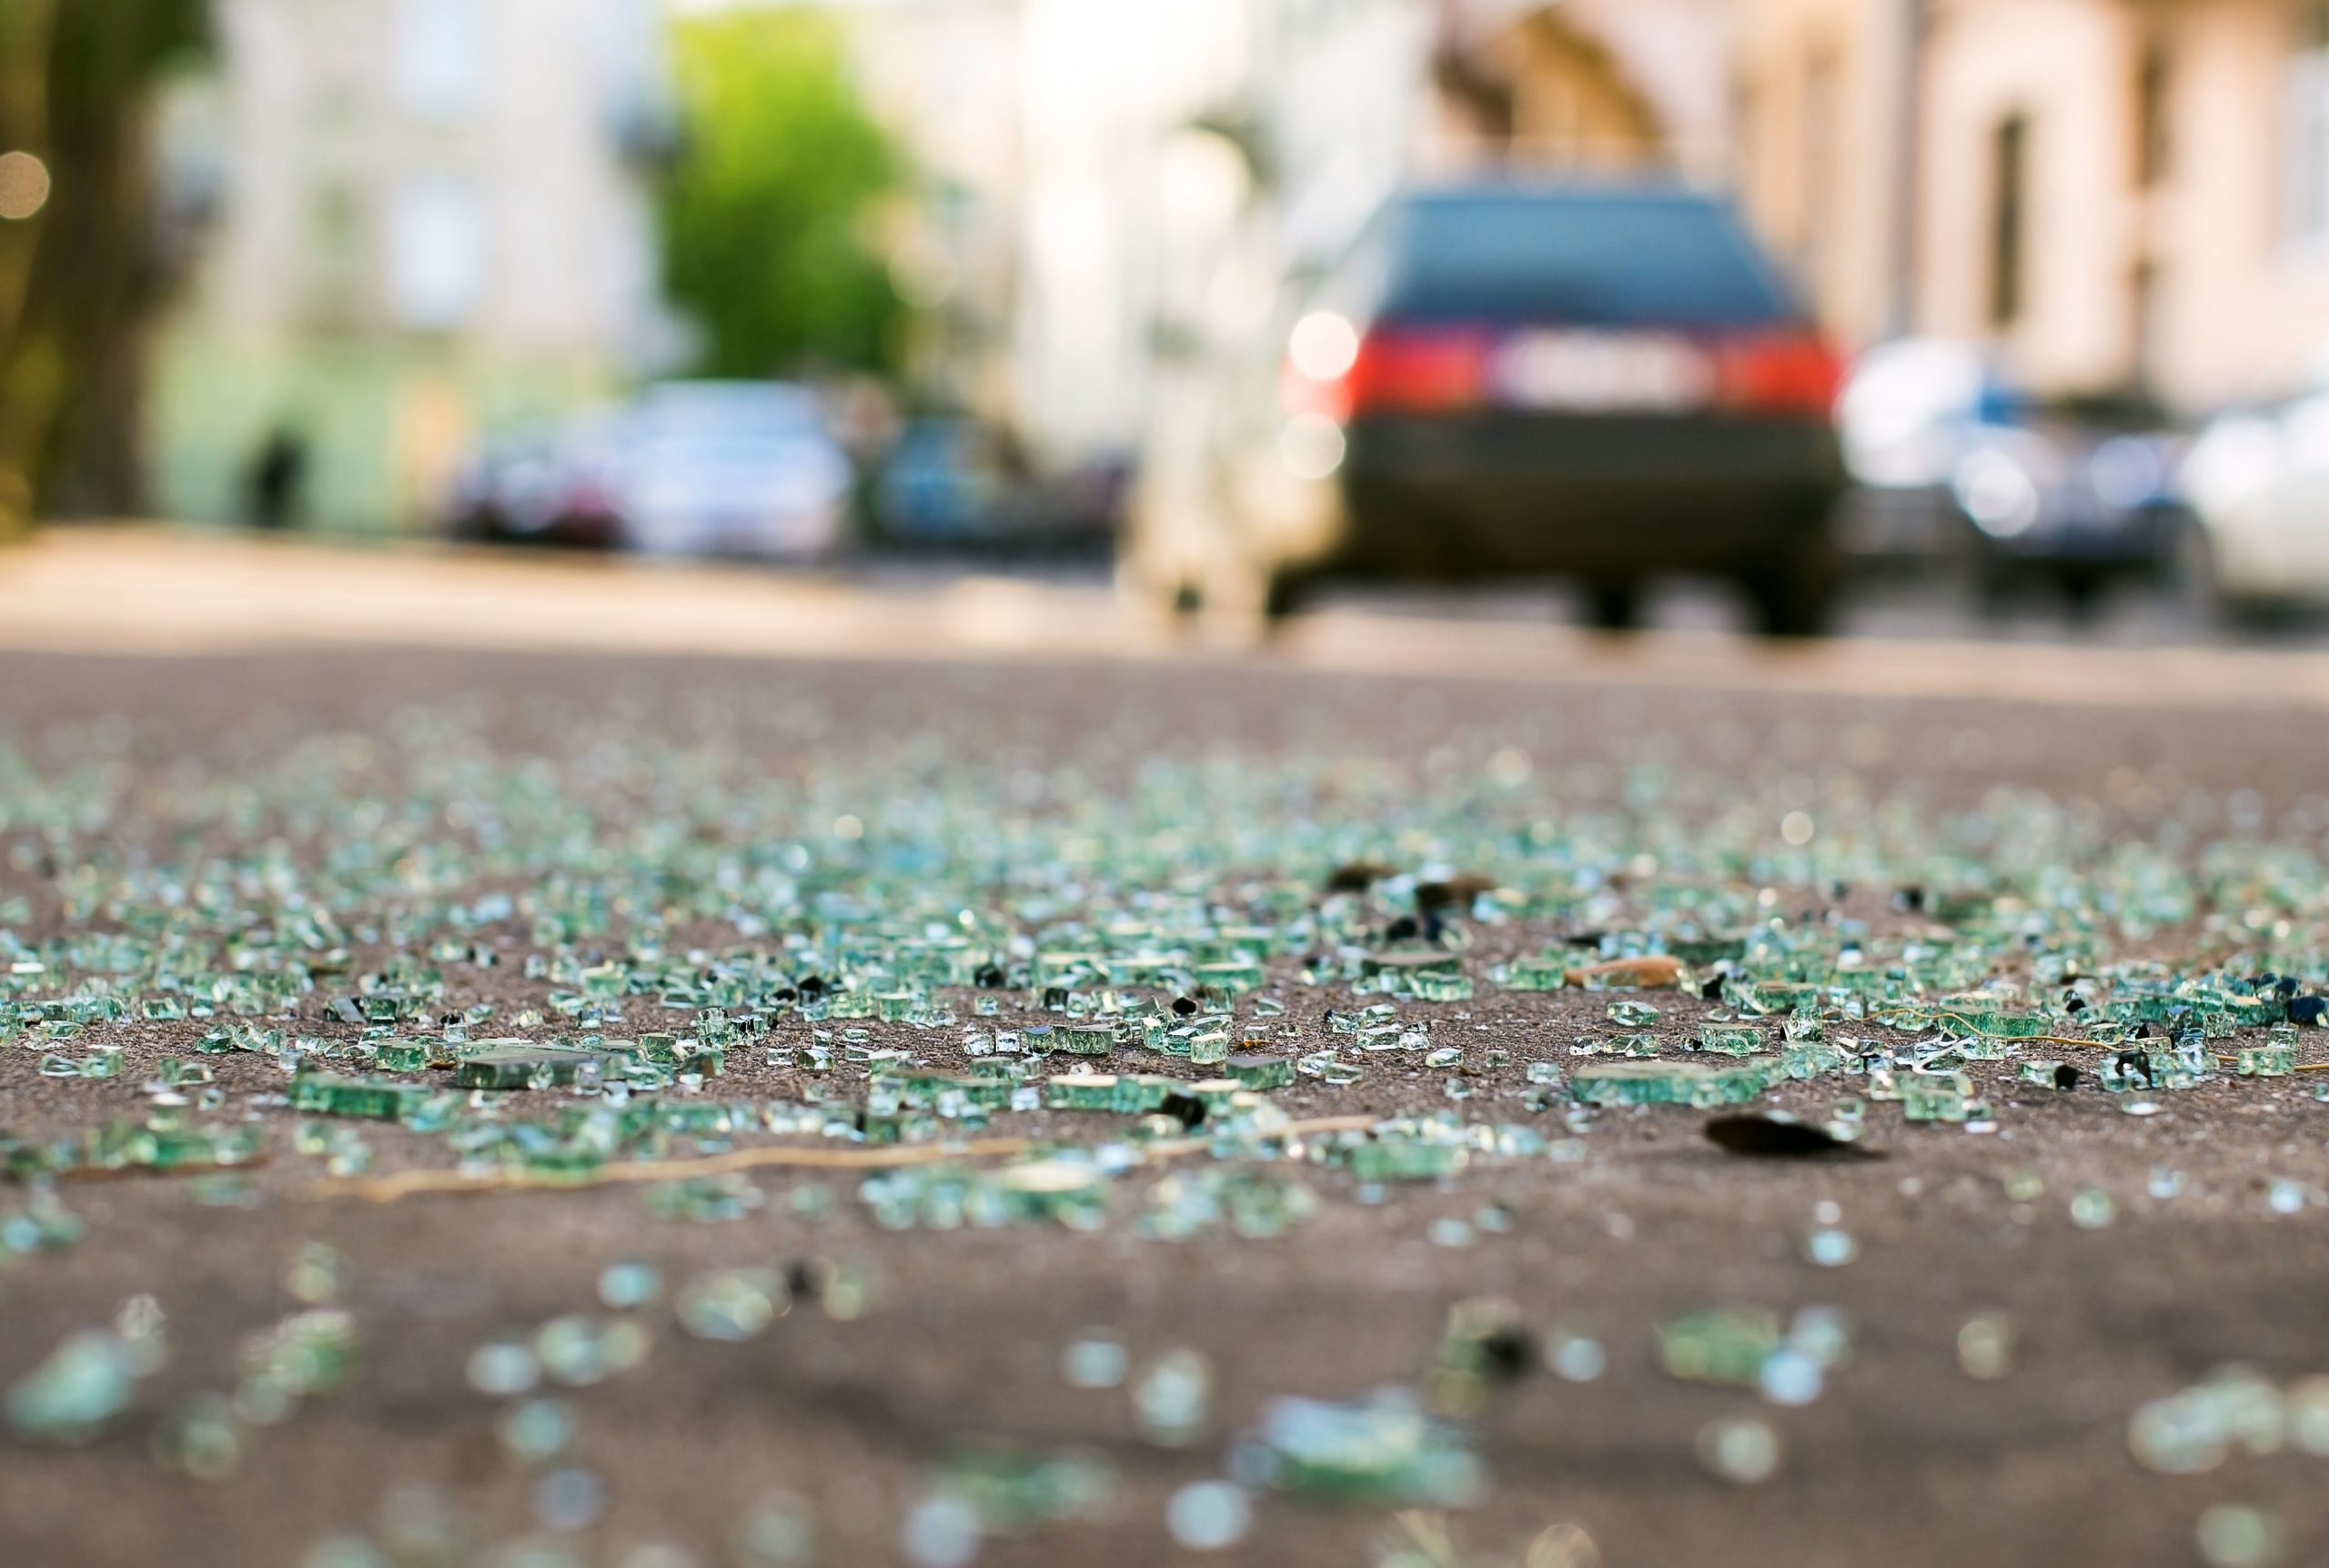 broken glass on street